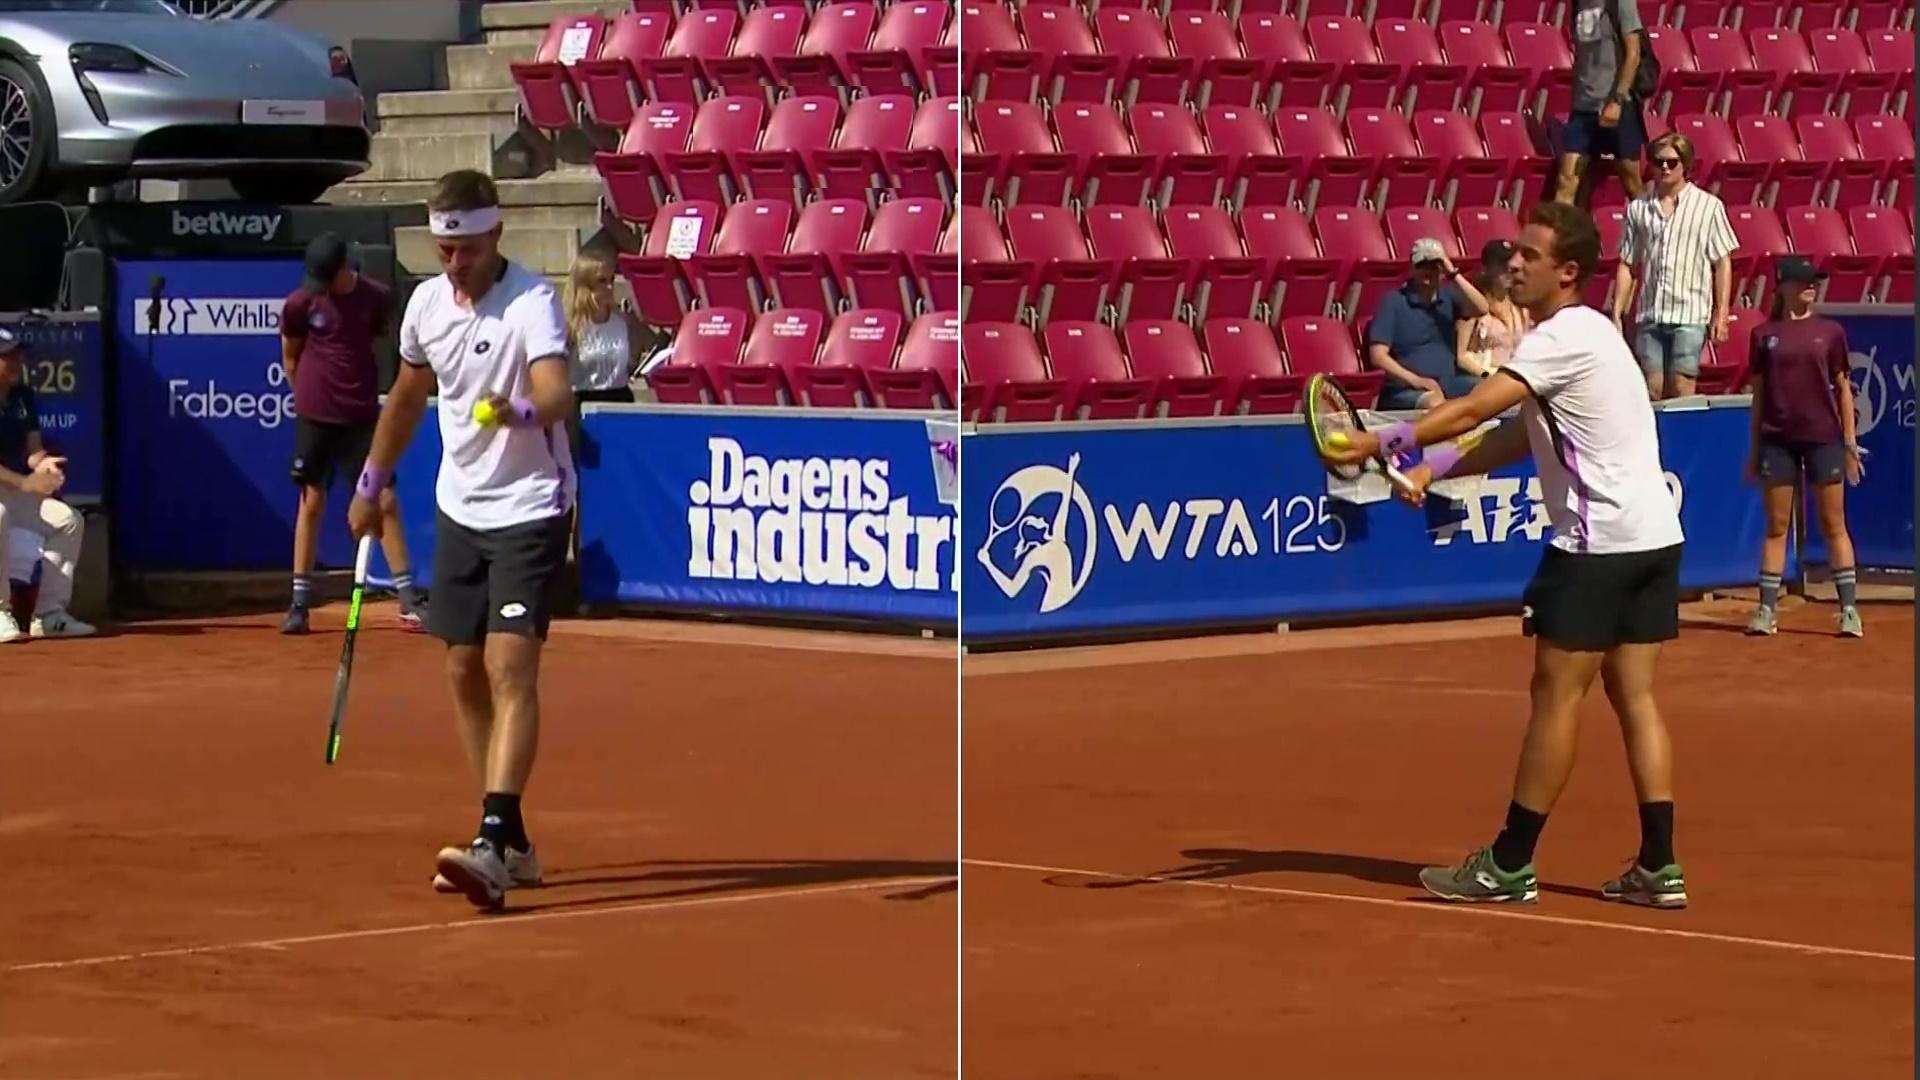 ATP 250 Torneo Bastad, 1/4 final: R. Carballés Baena - N. Go